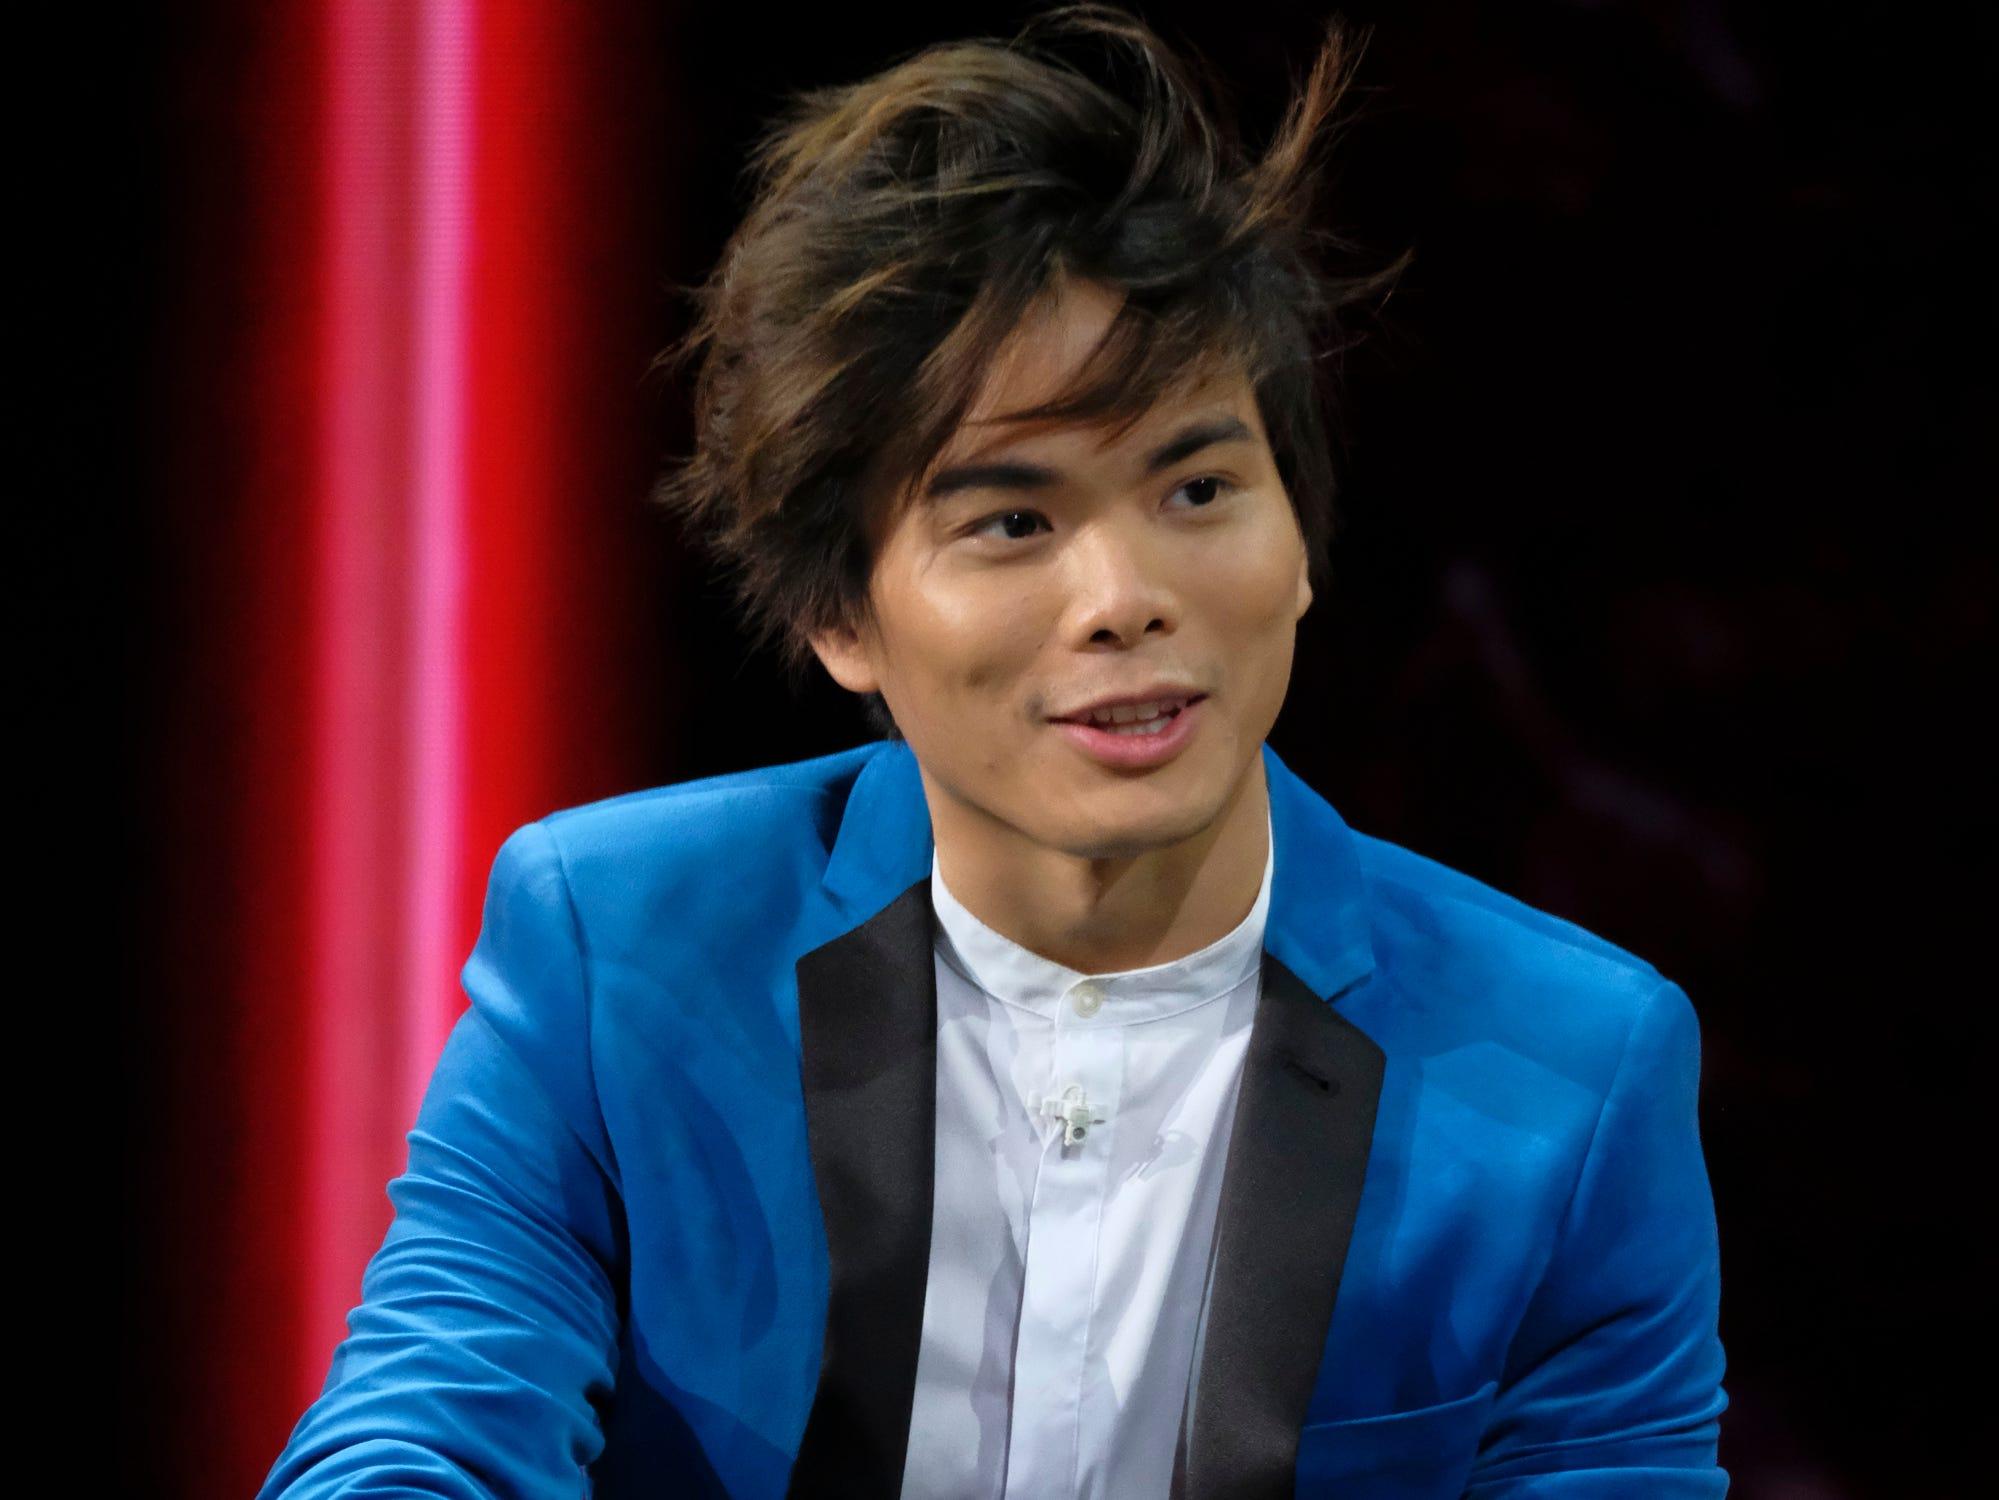 'America's Got Talent': Magician Shin Lim wins Season 13